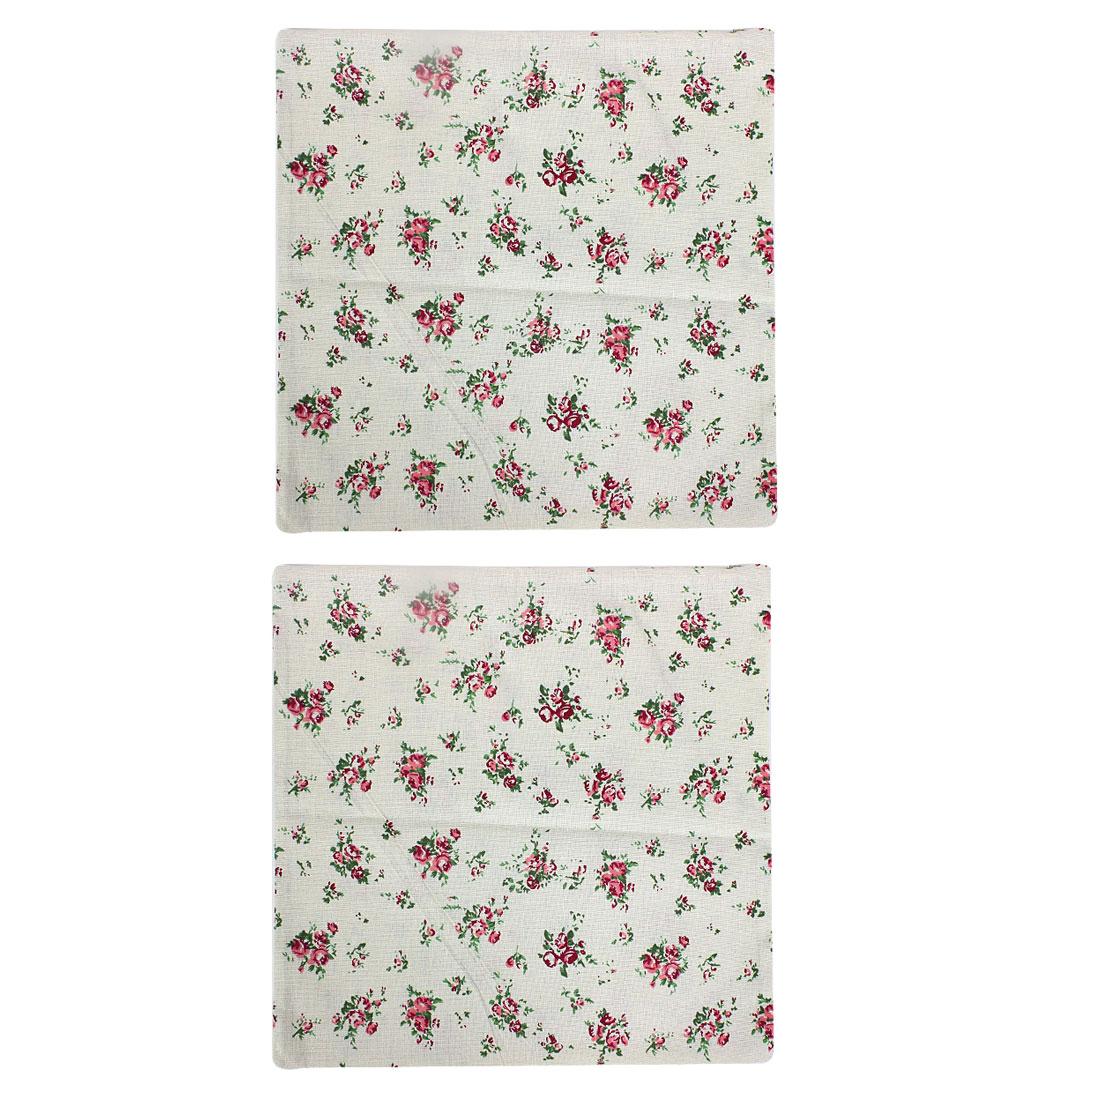 Linen Flower Pattern Pillow Cushion Case Cover Pillowcase 45x45cm 2pcs